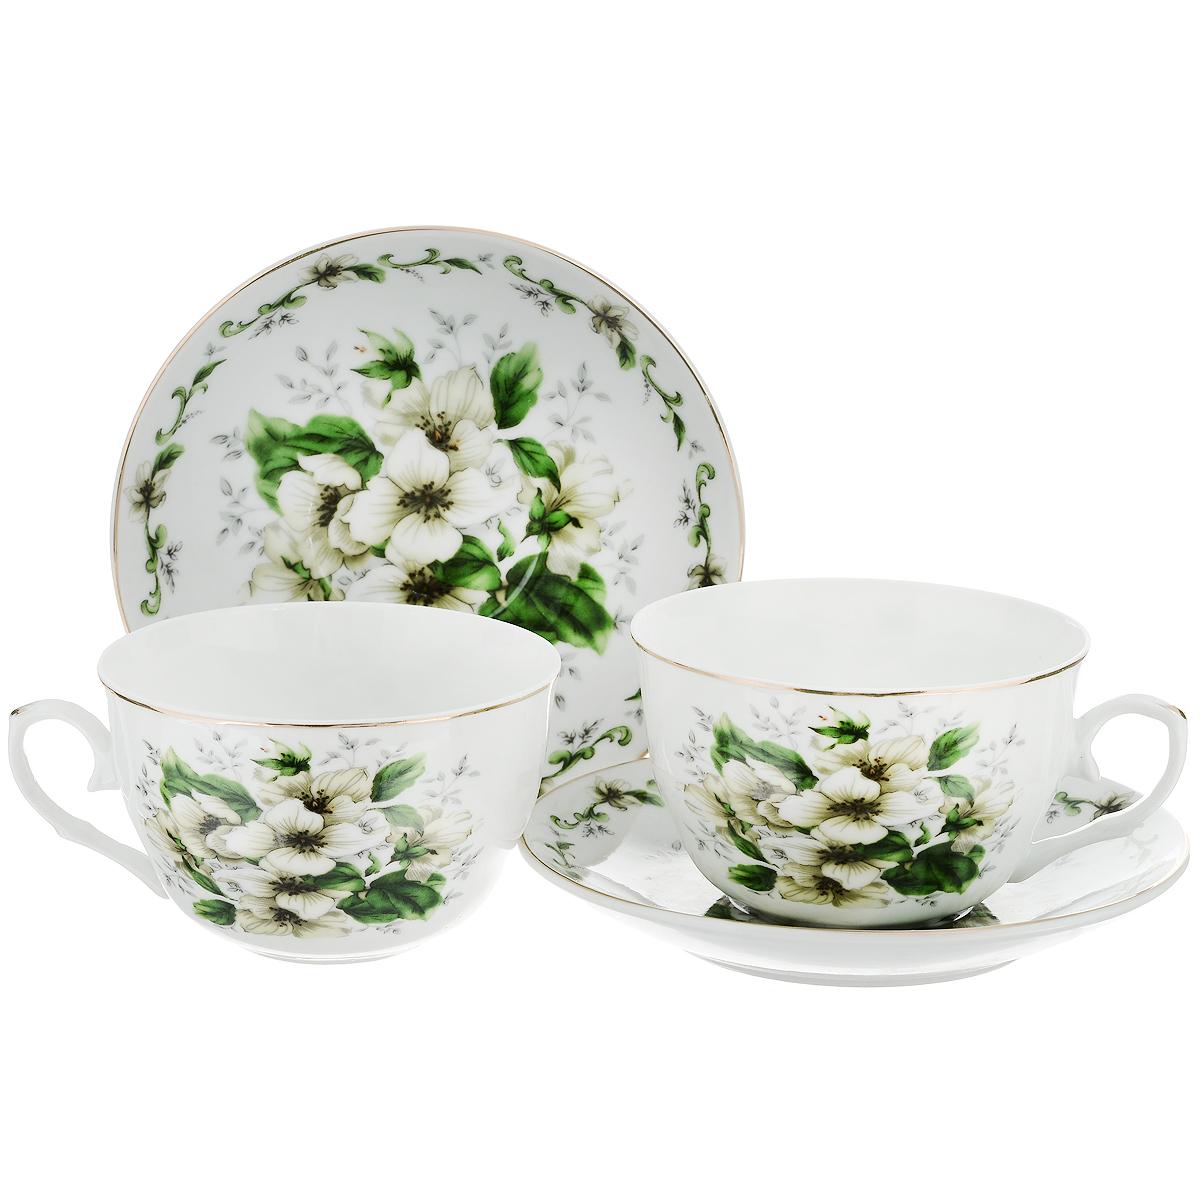 Набор чайный Briswild Цветочная грация, 4 предмета